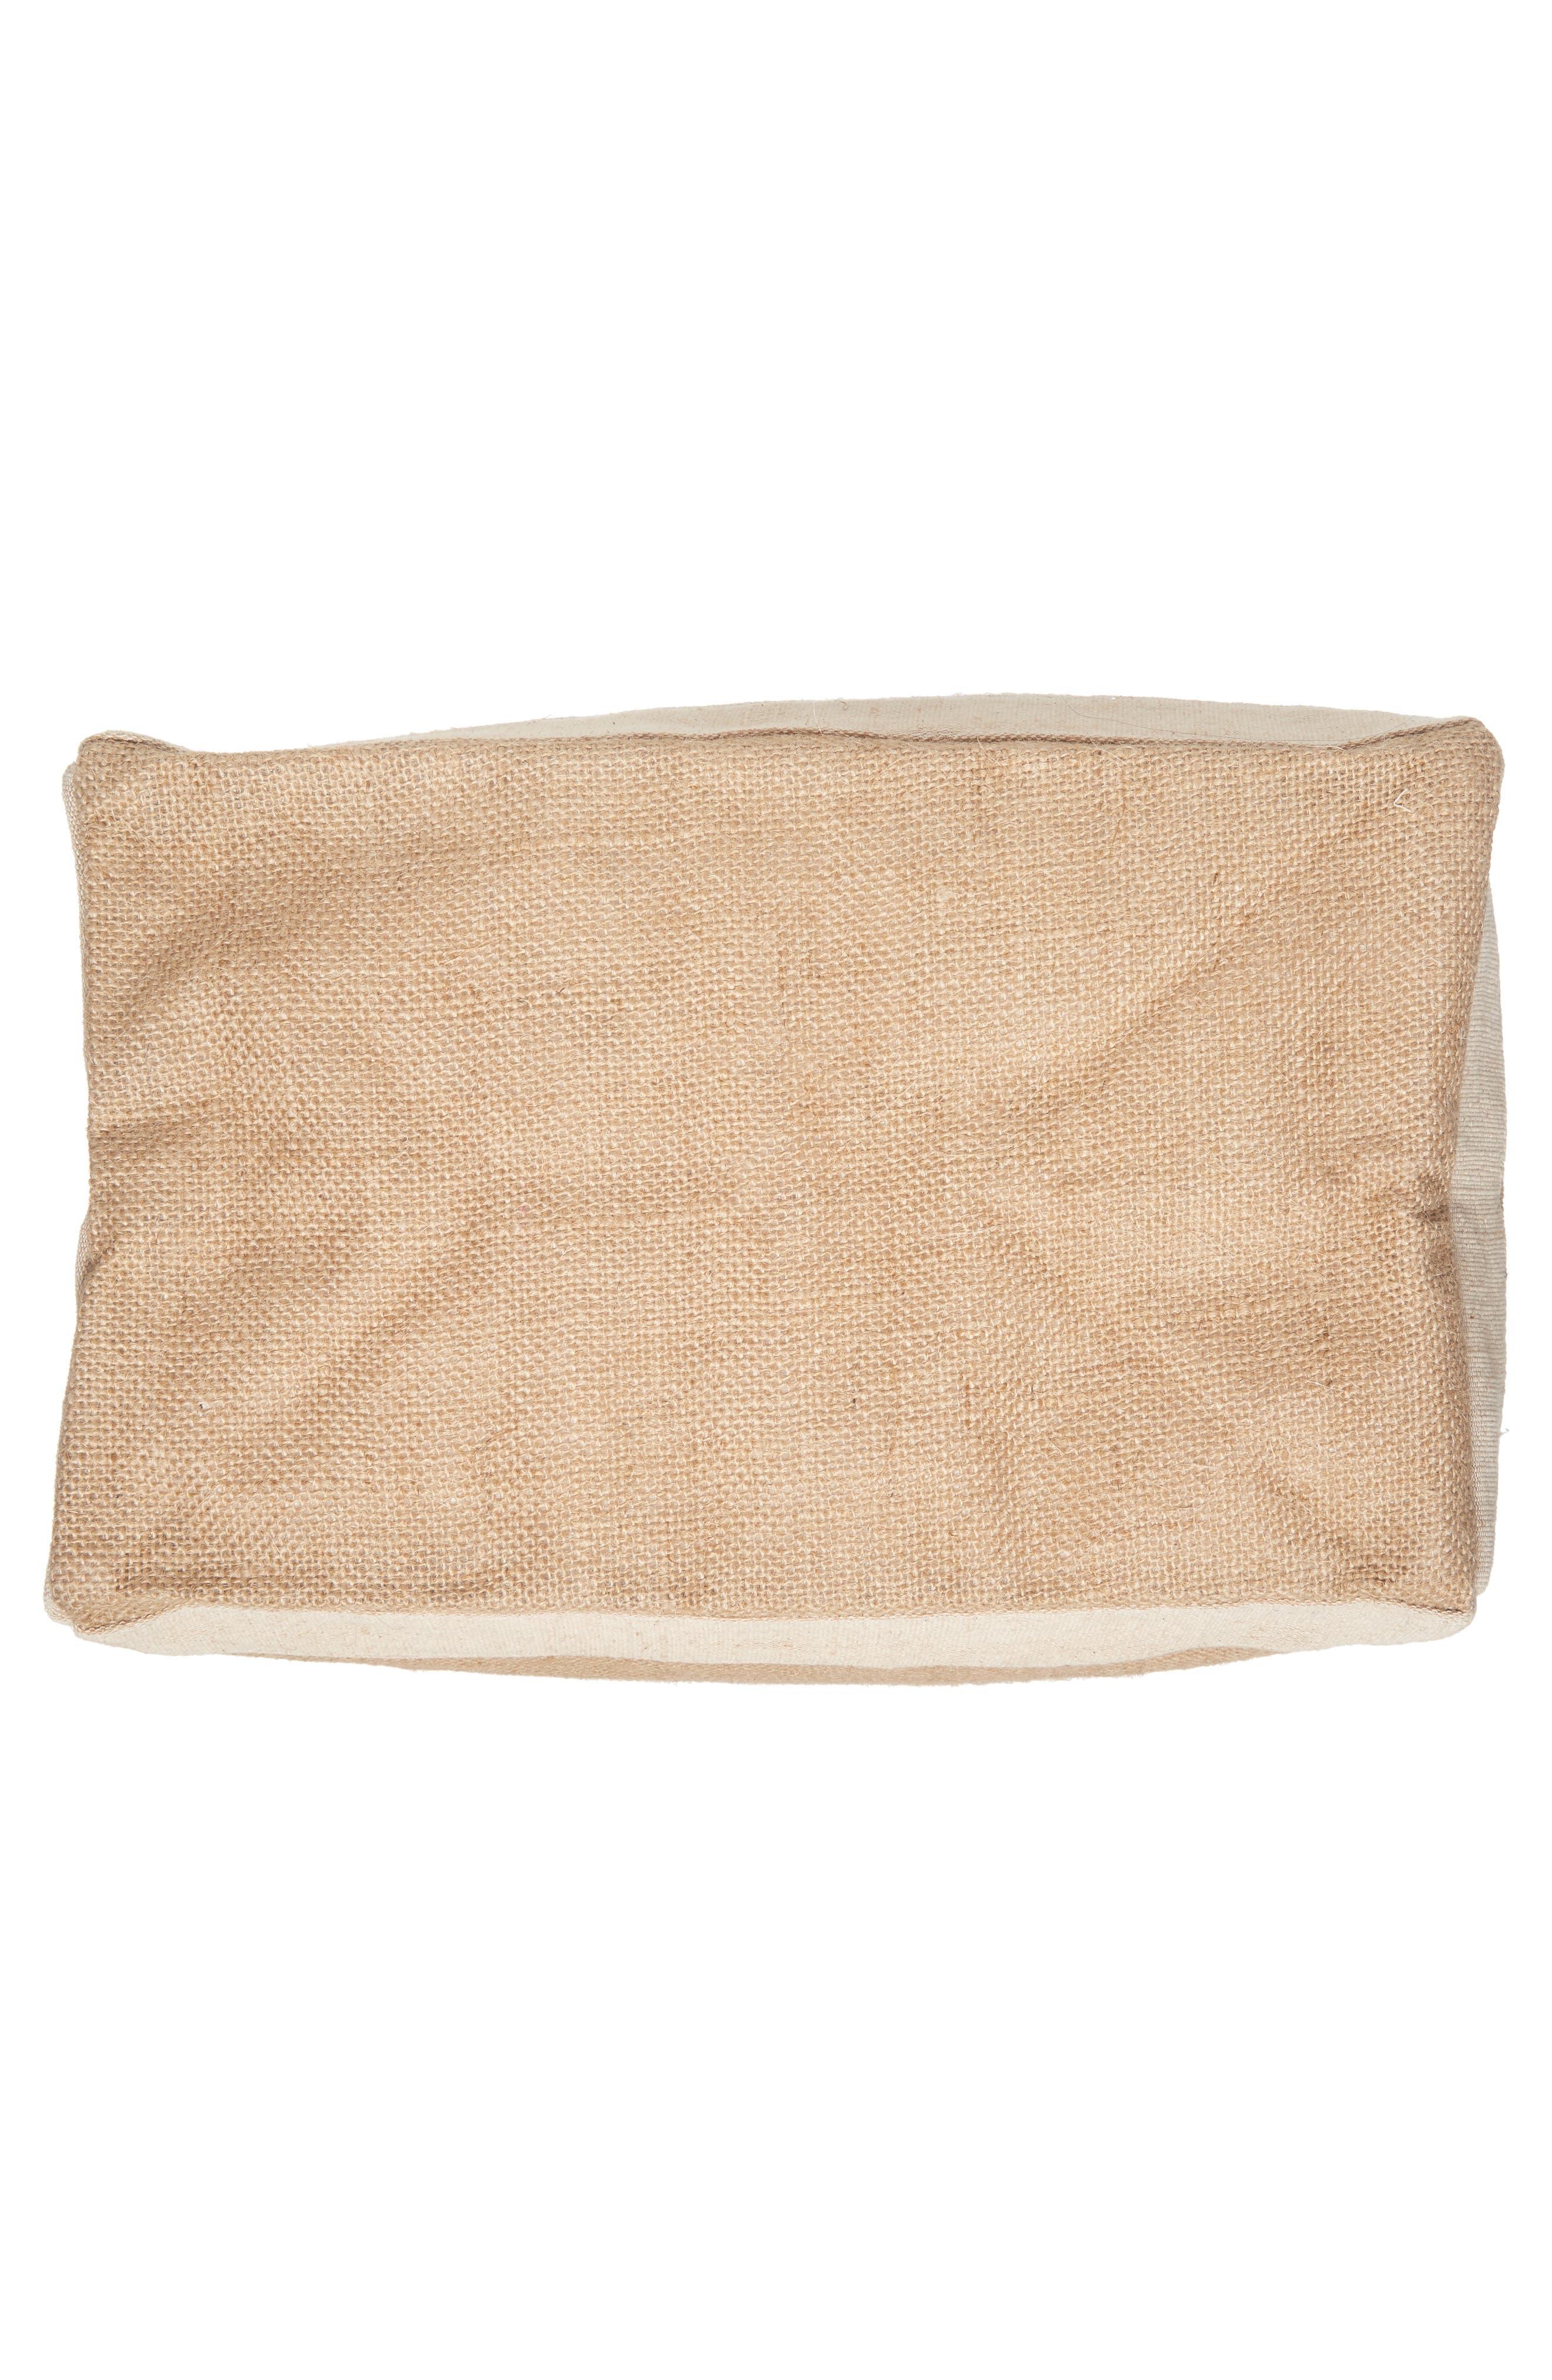 Chicago Simple Market Bag,                             Alternate thumbnail 6, color,                             200